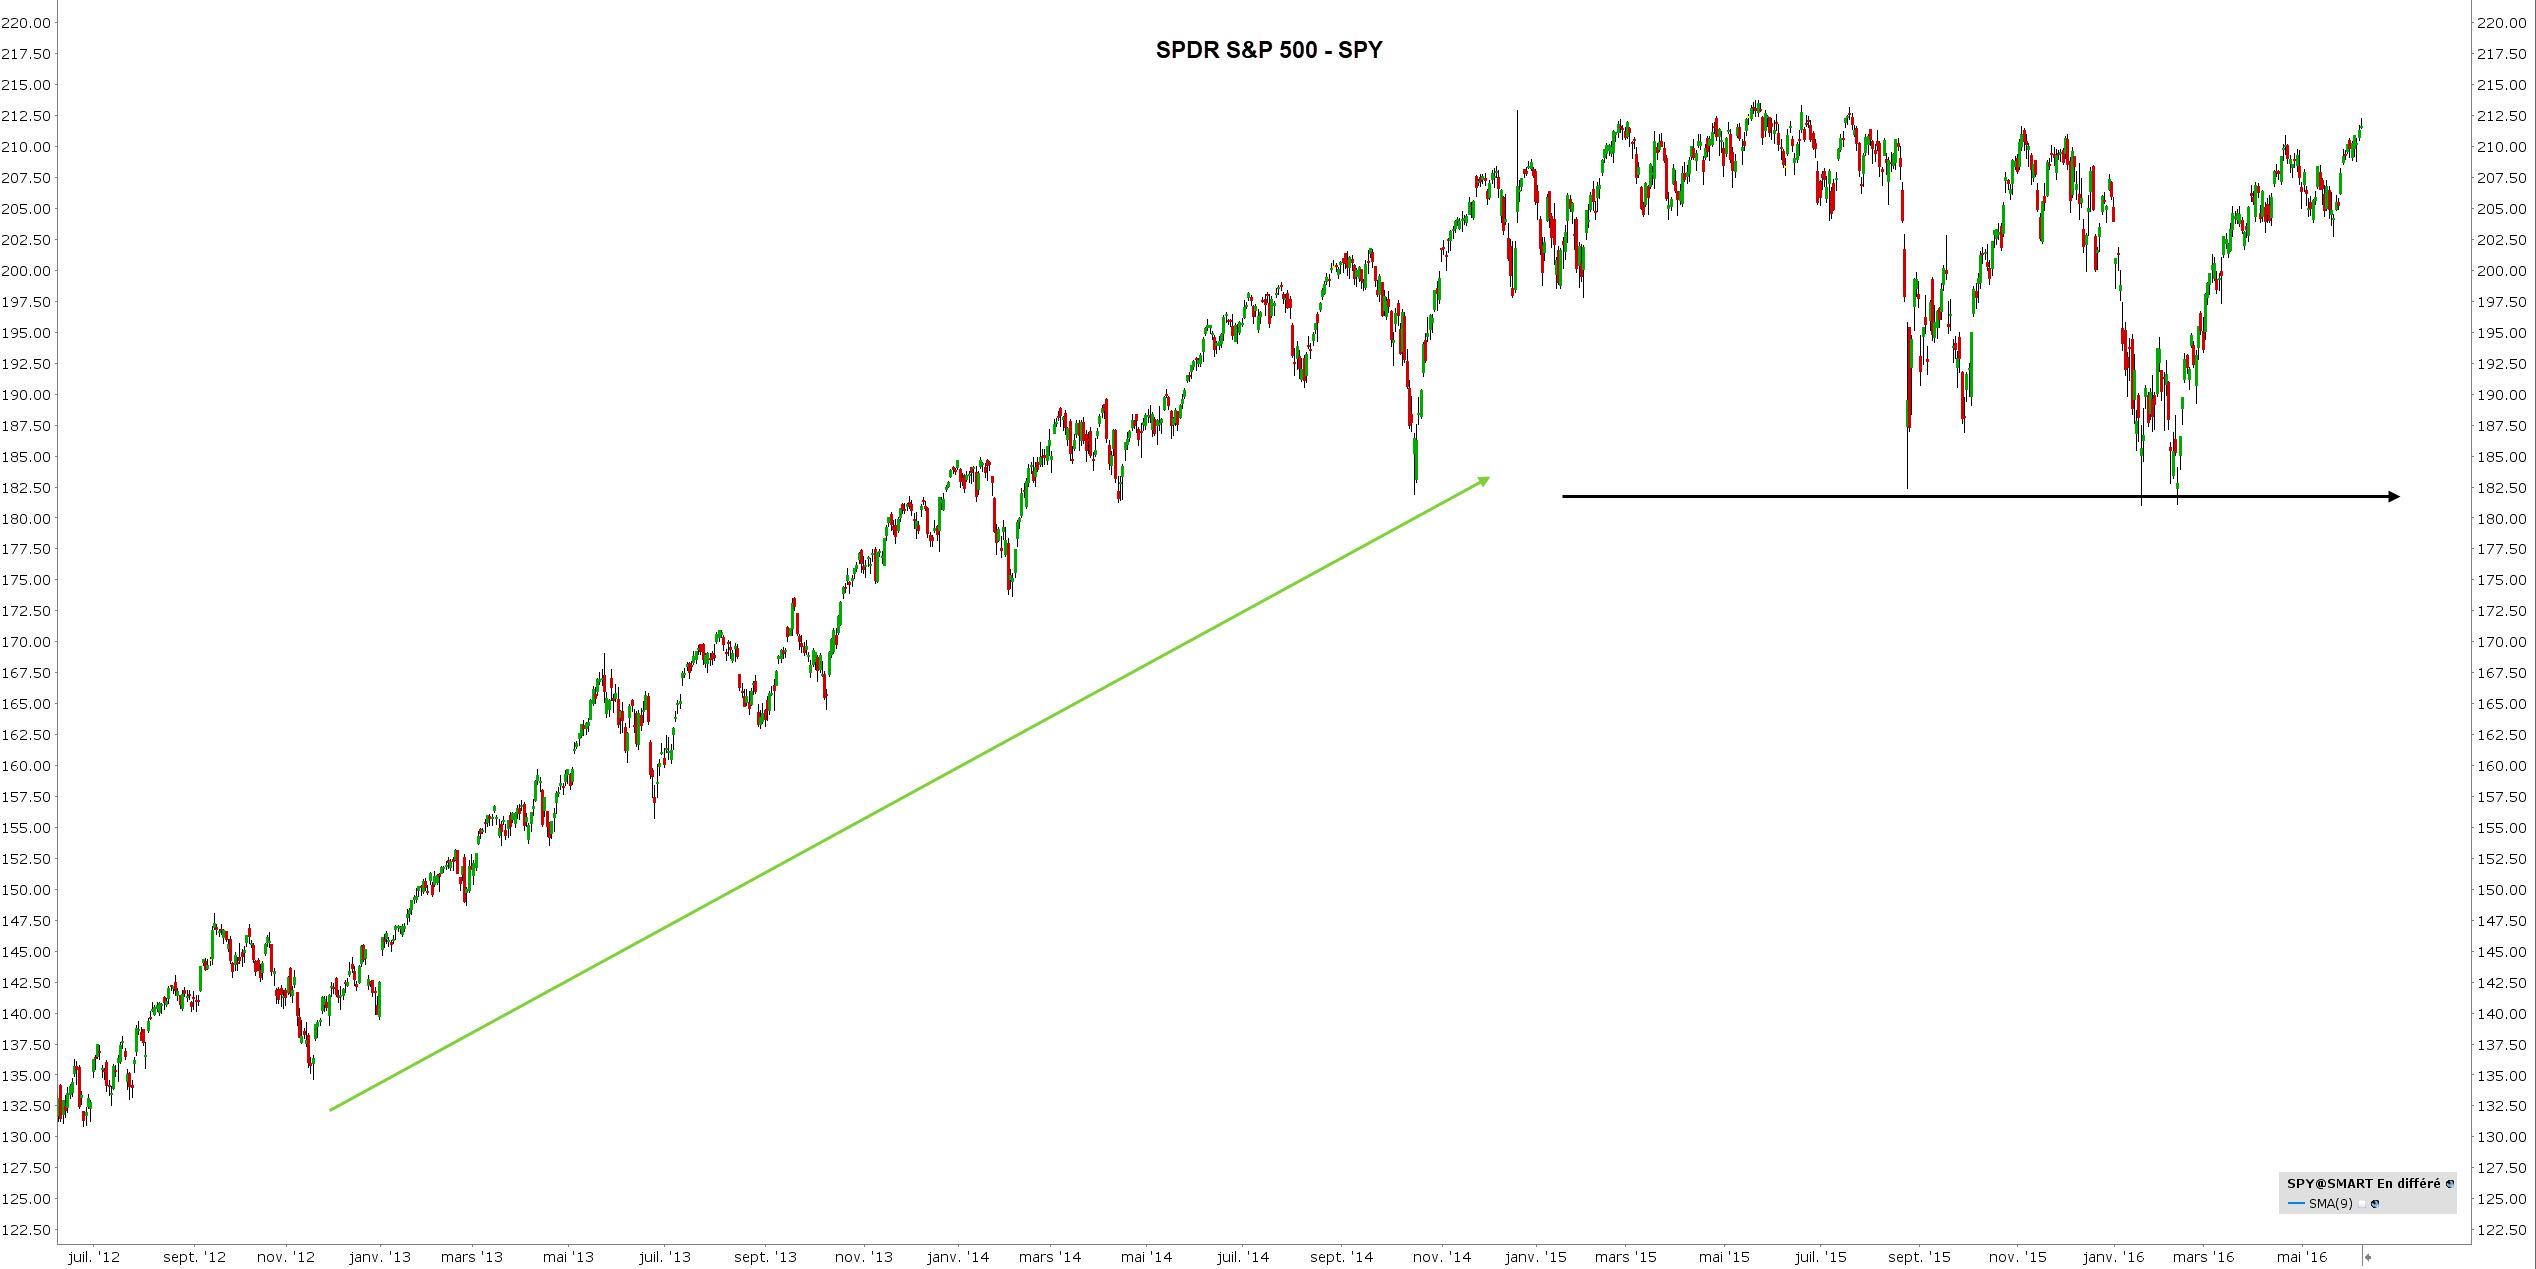 correlation trading - correlation bourse - s&p500